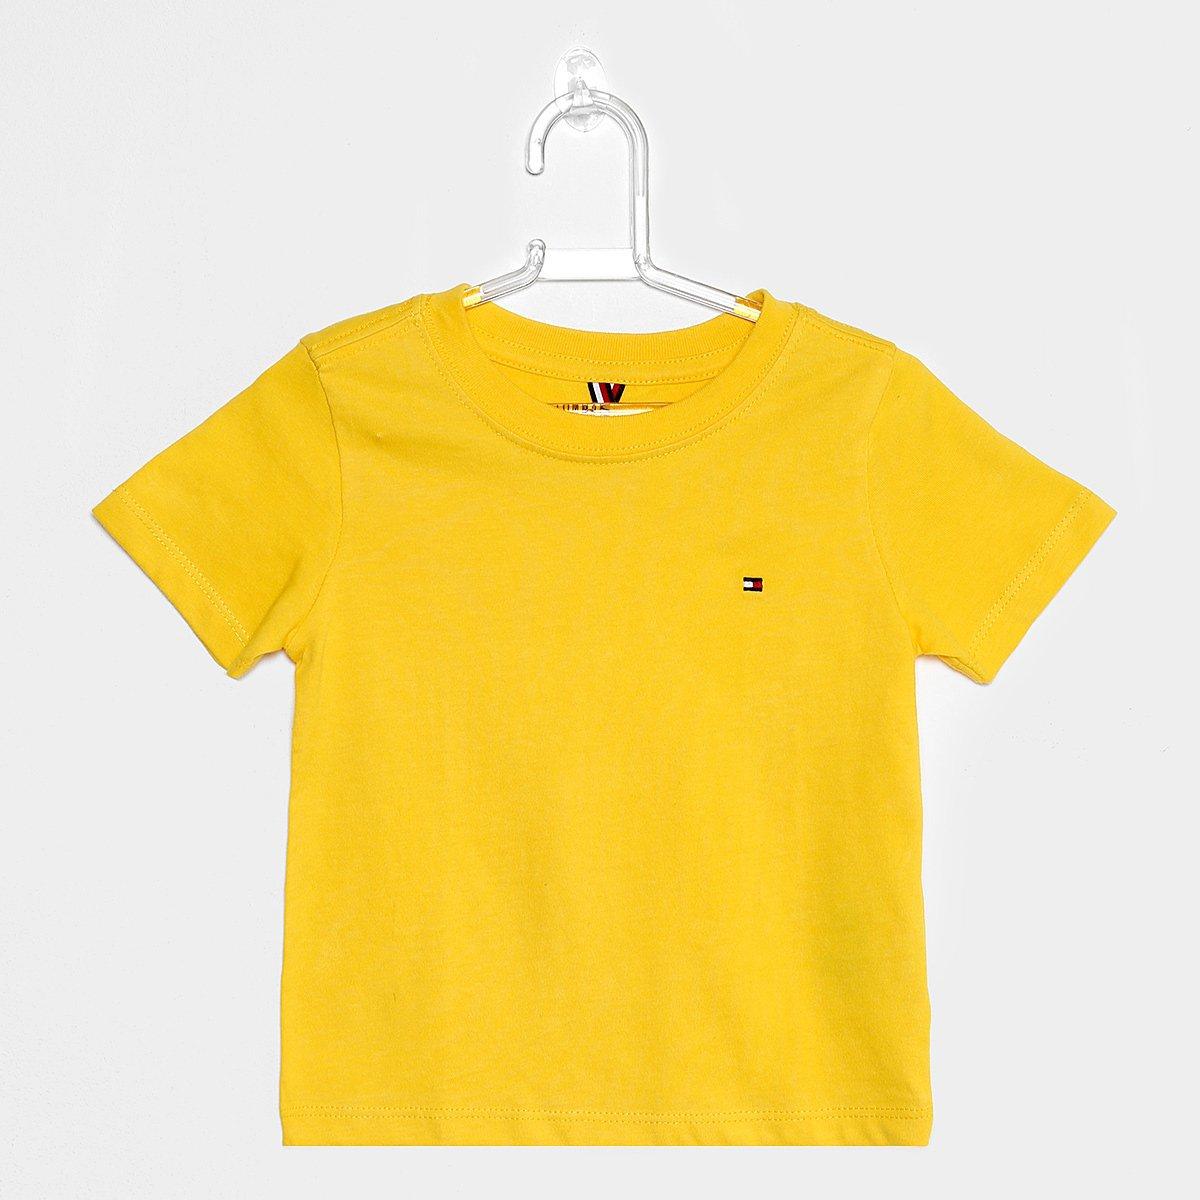 Camiseta Infantil Tommy Hilfiger Nantucket Masculina - Compre Agora ... a76a5618646